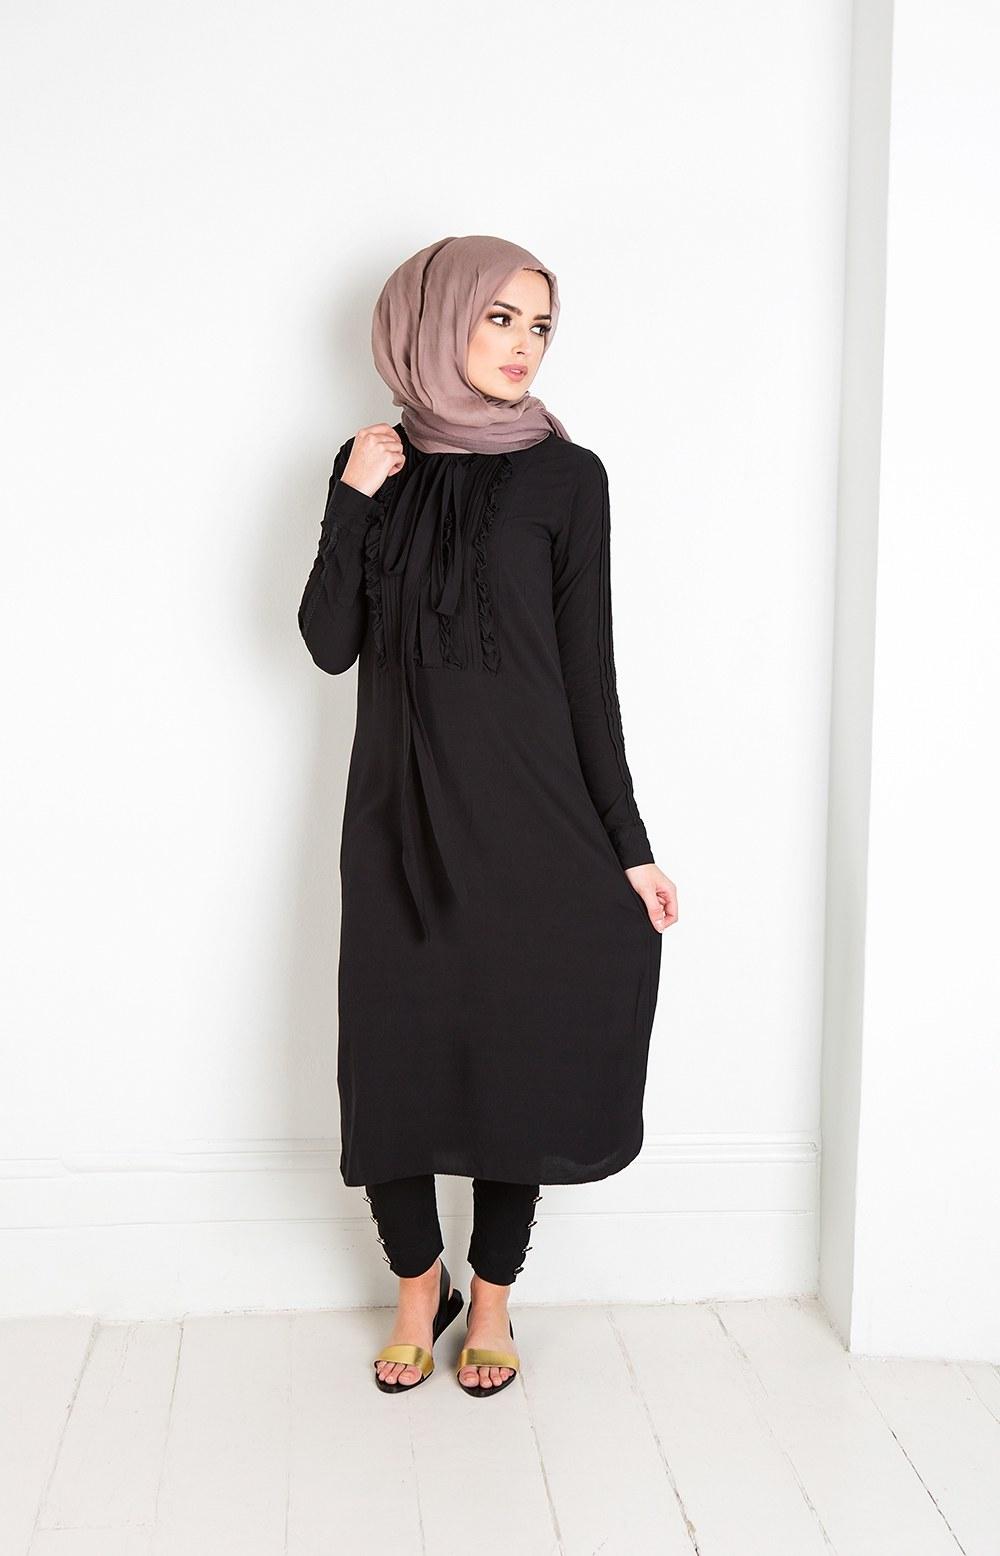 Design Model Baju Lebaran Sekarang O2d5 25 Trend Model Baju Muslim Lebaran 2018 Simple & Modis